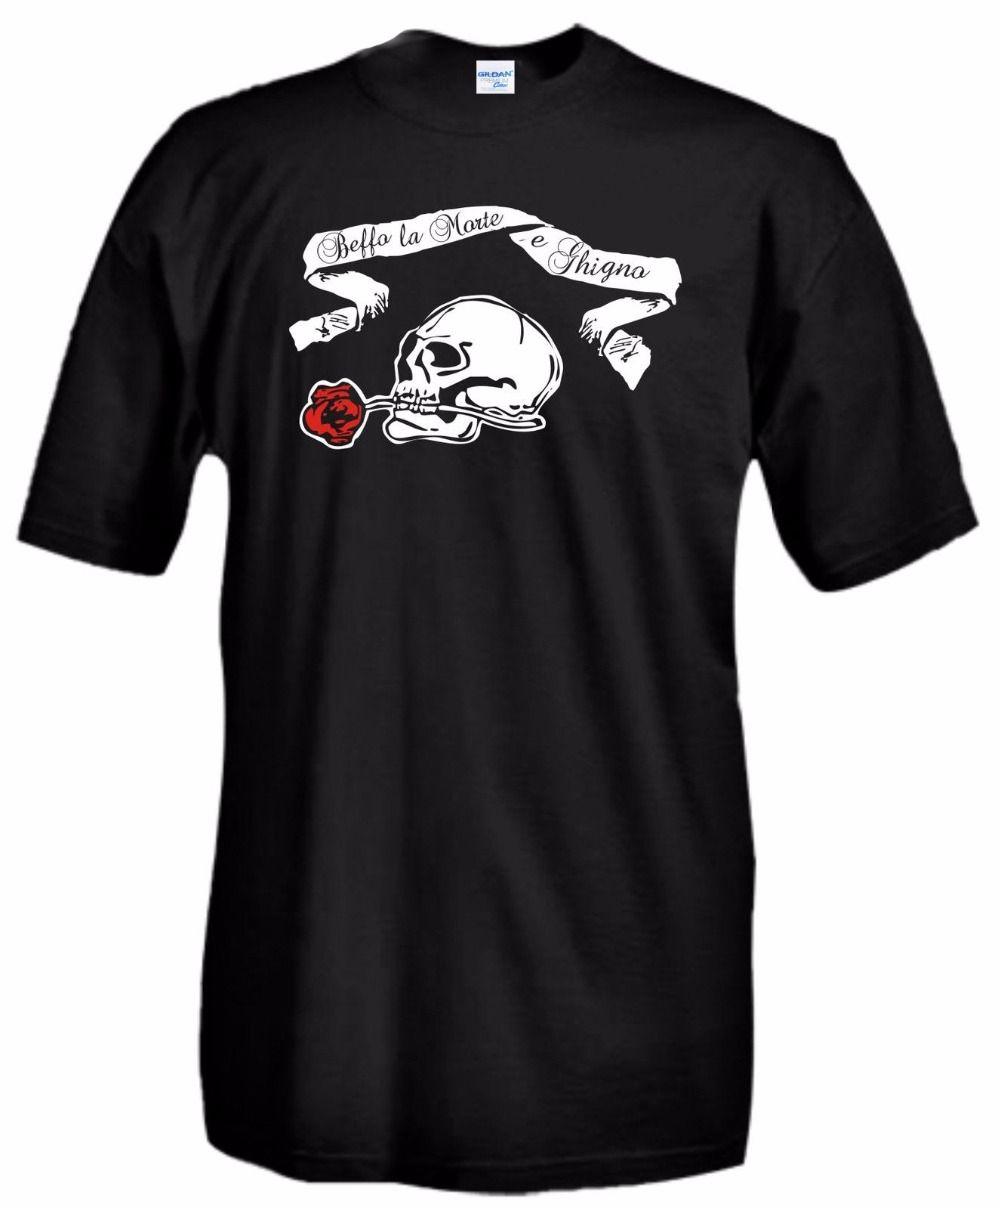 Individuell gestaltete T-Shirts Männer-T-Shirts La Felpa E Sorridere Fiume Motti Annunzio T-Shirt Sweatshirt